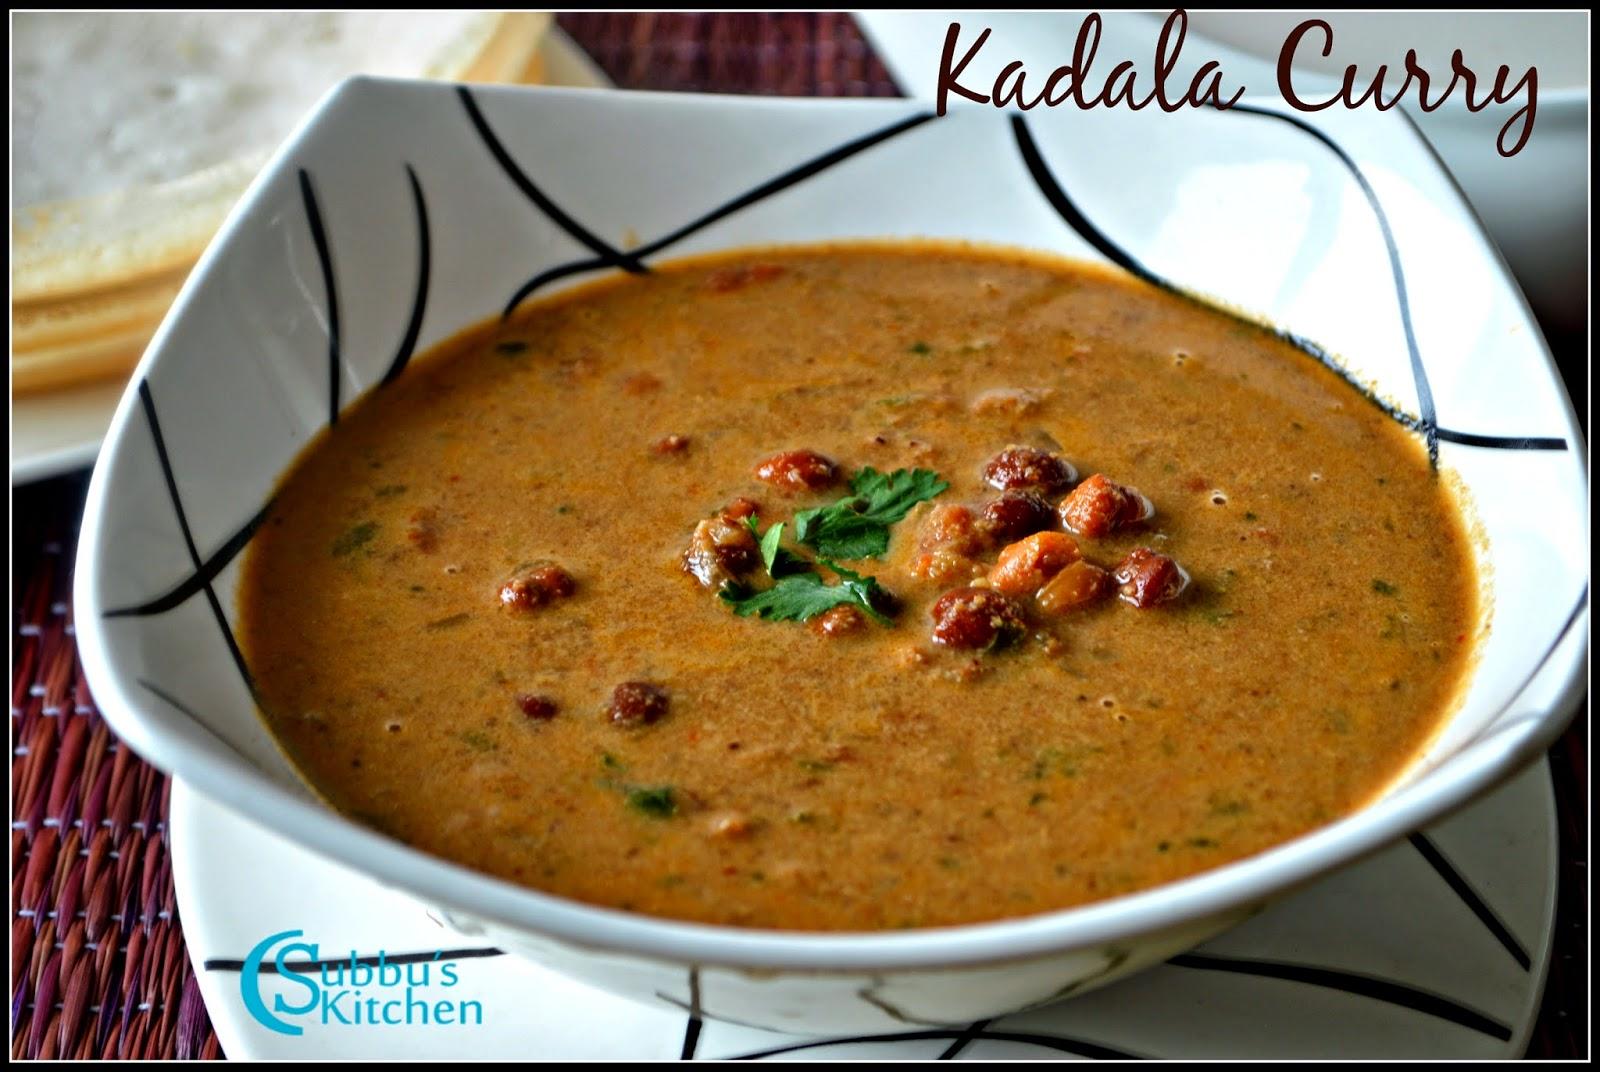 Kadala curry recipe kerala style kadala curry recipe kadala kadala curry recipe kerala style kadala curry recipe kadala curry for appam forumfinder Choice Image